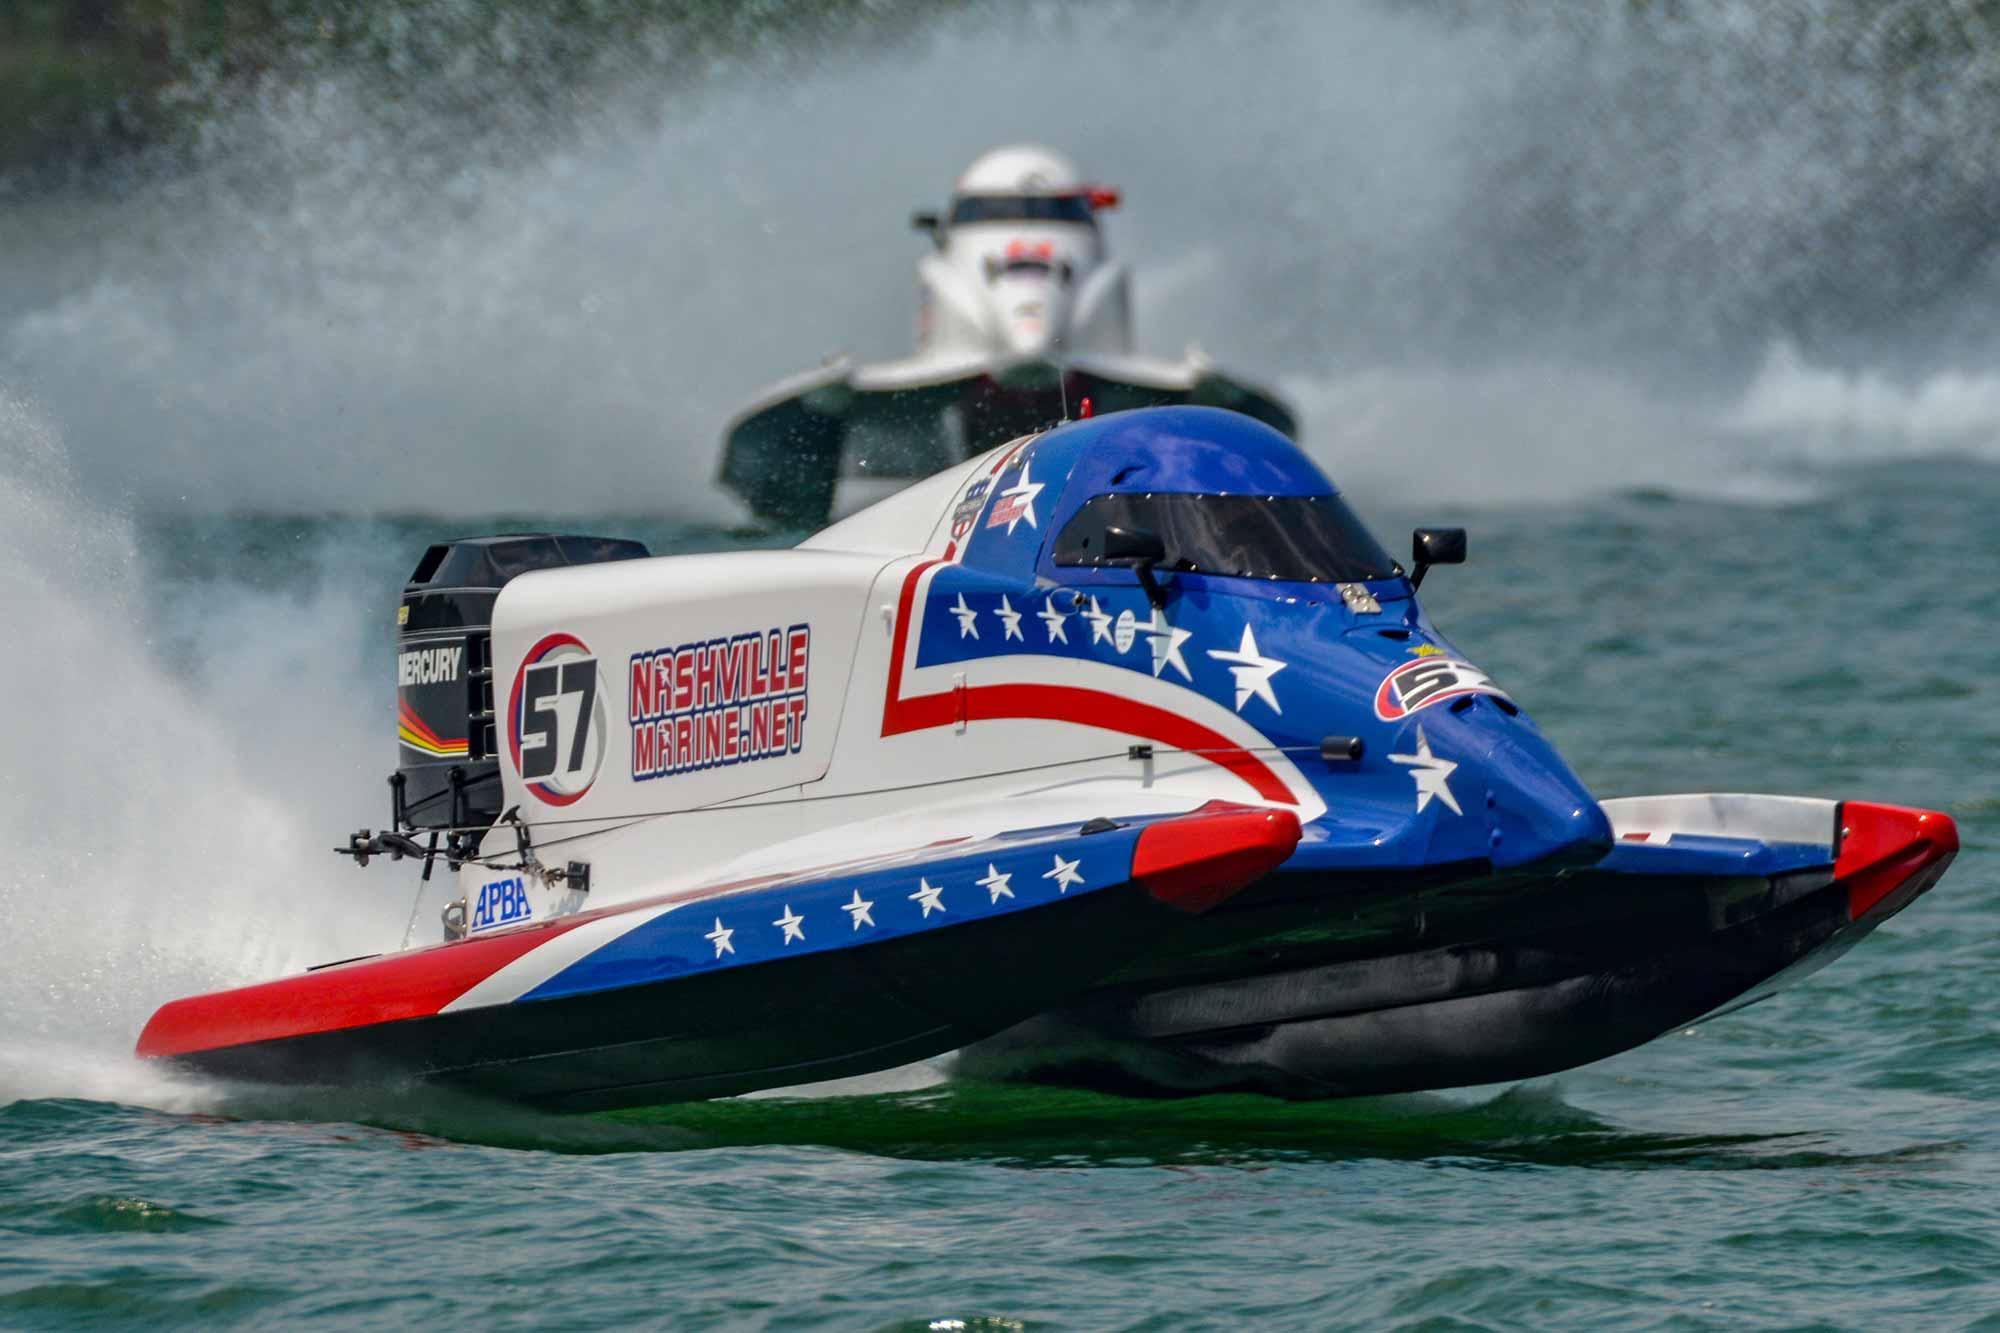 McMurray-Racing-Nashvill-Marine-2021-Springfield-F1-Race-52